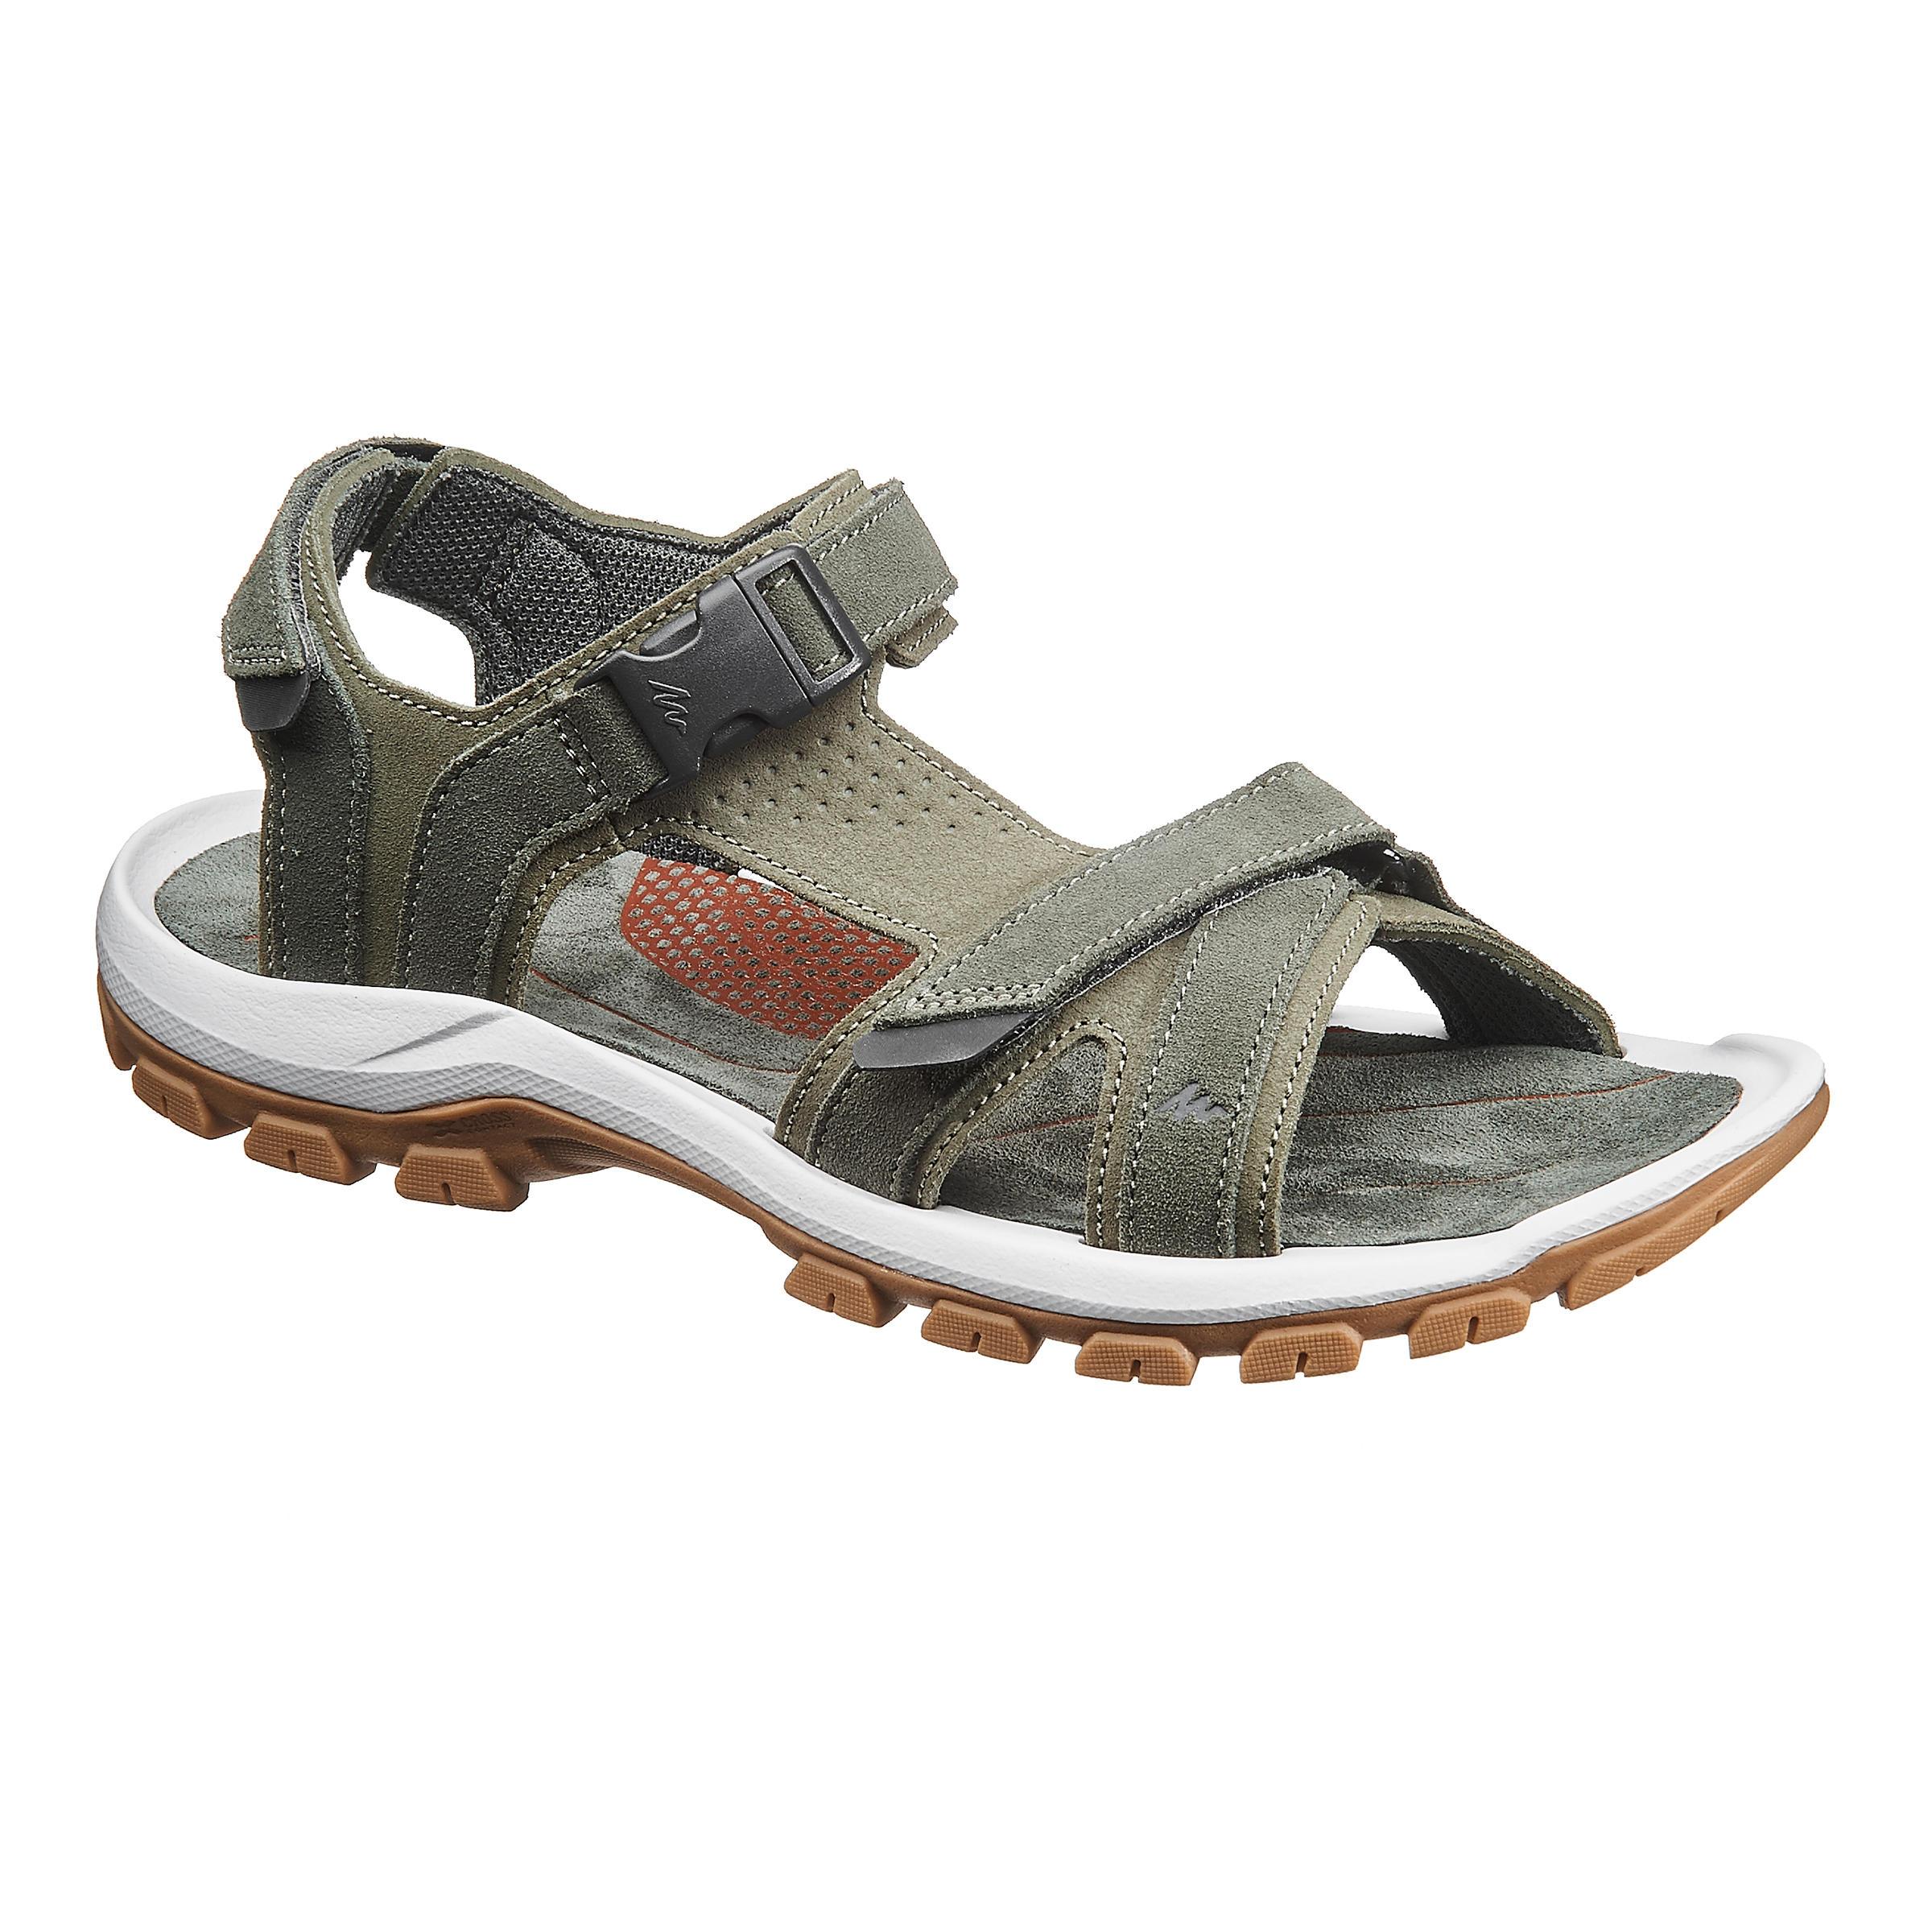 Men's Sandals NH120 - Khaki - DecathlonB2B